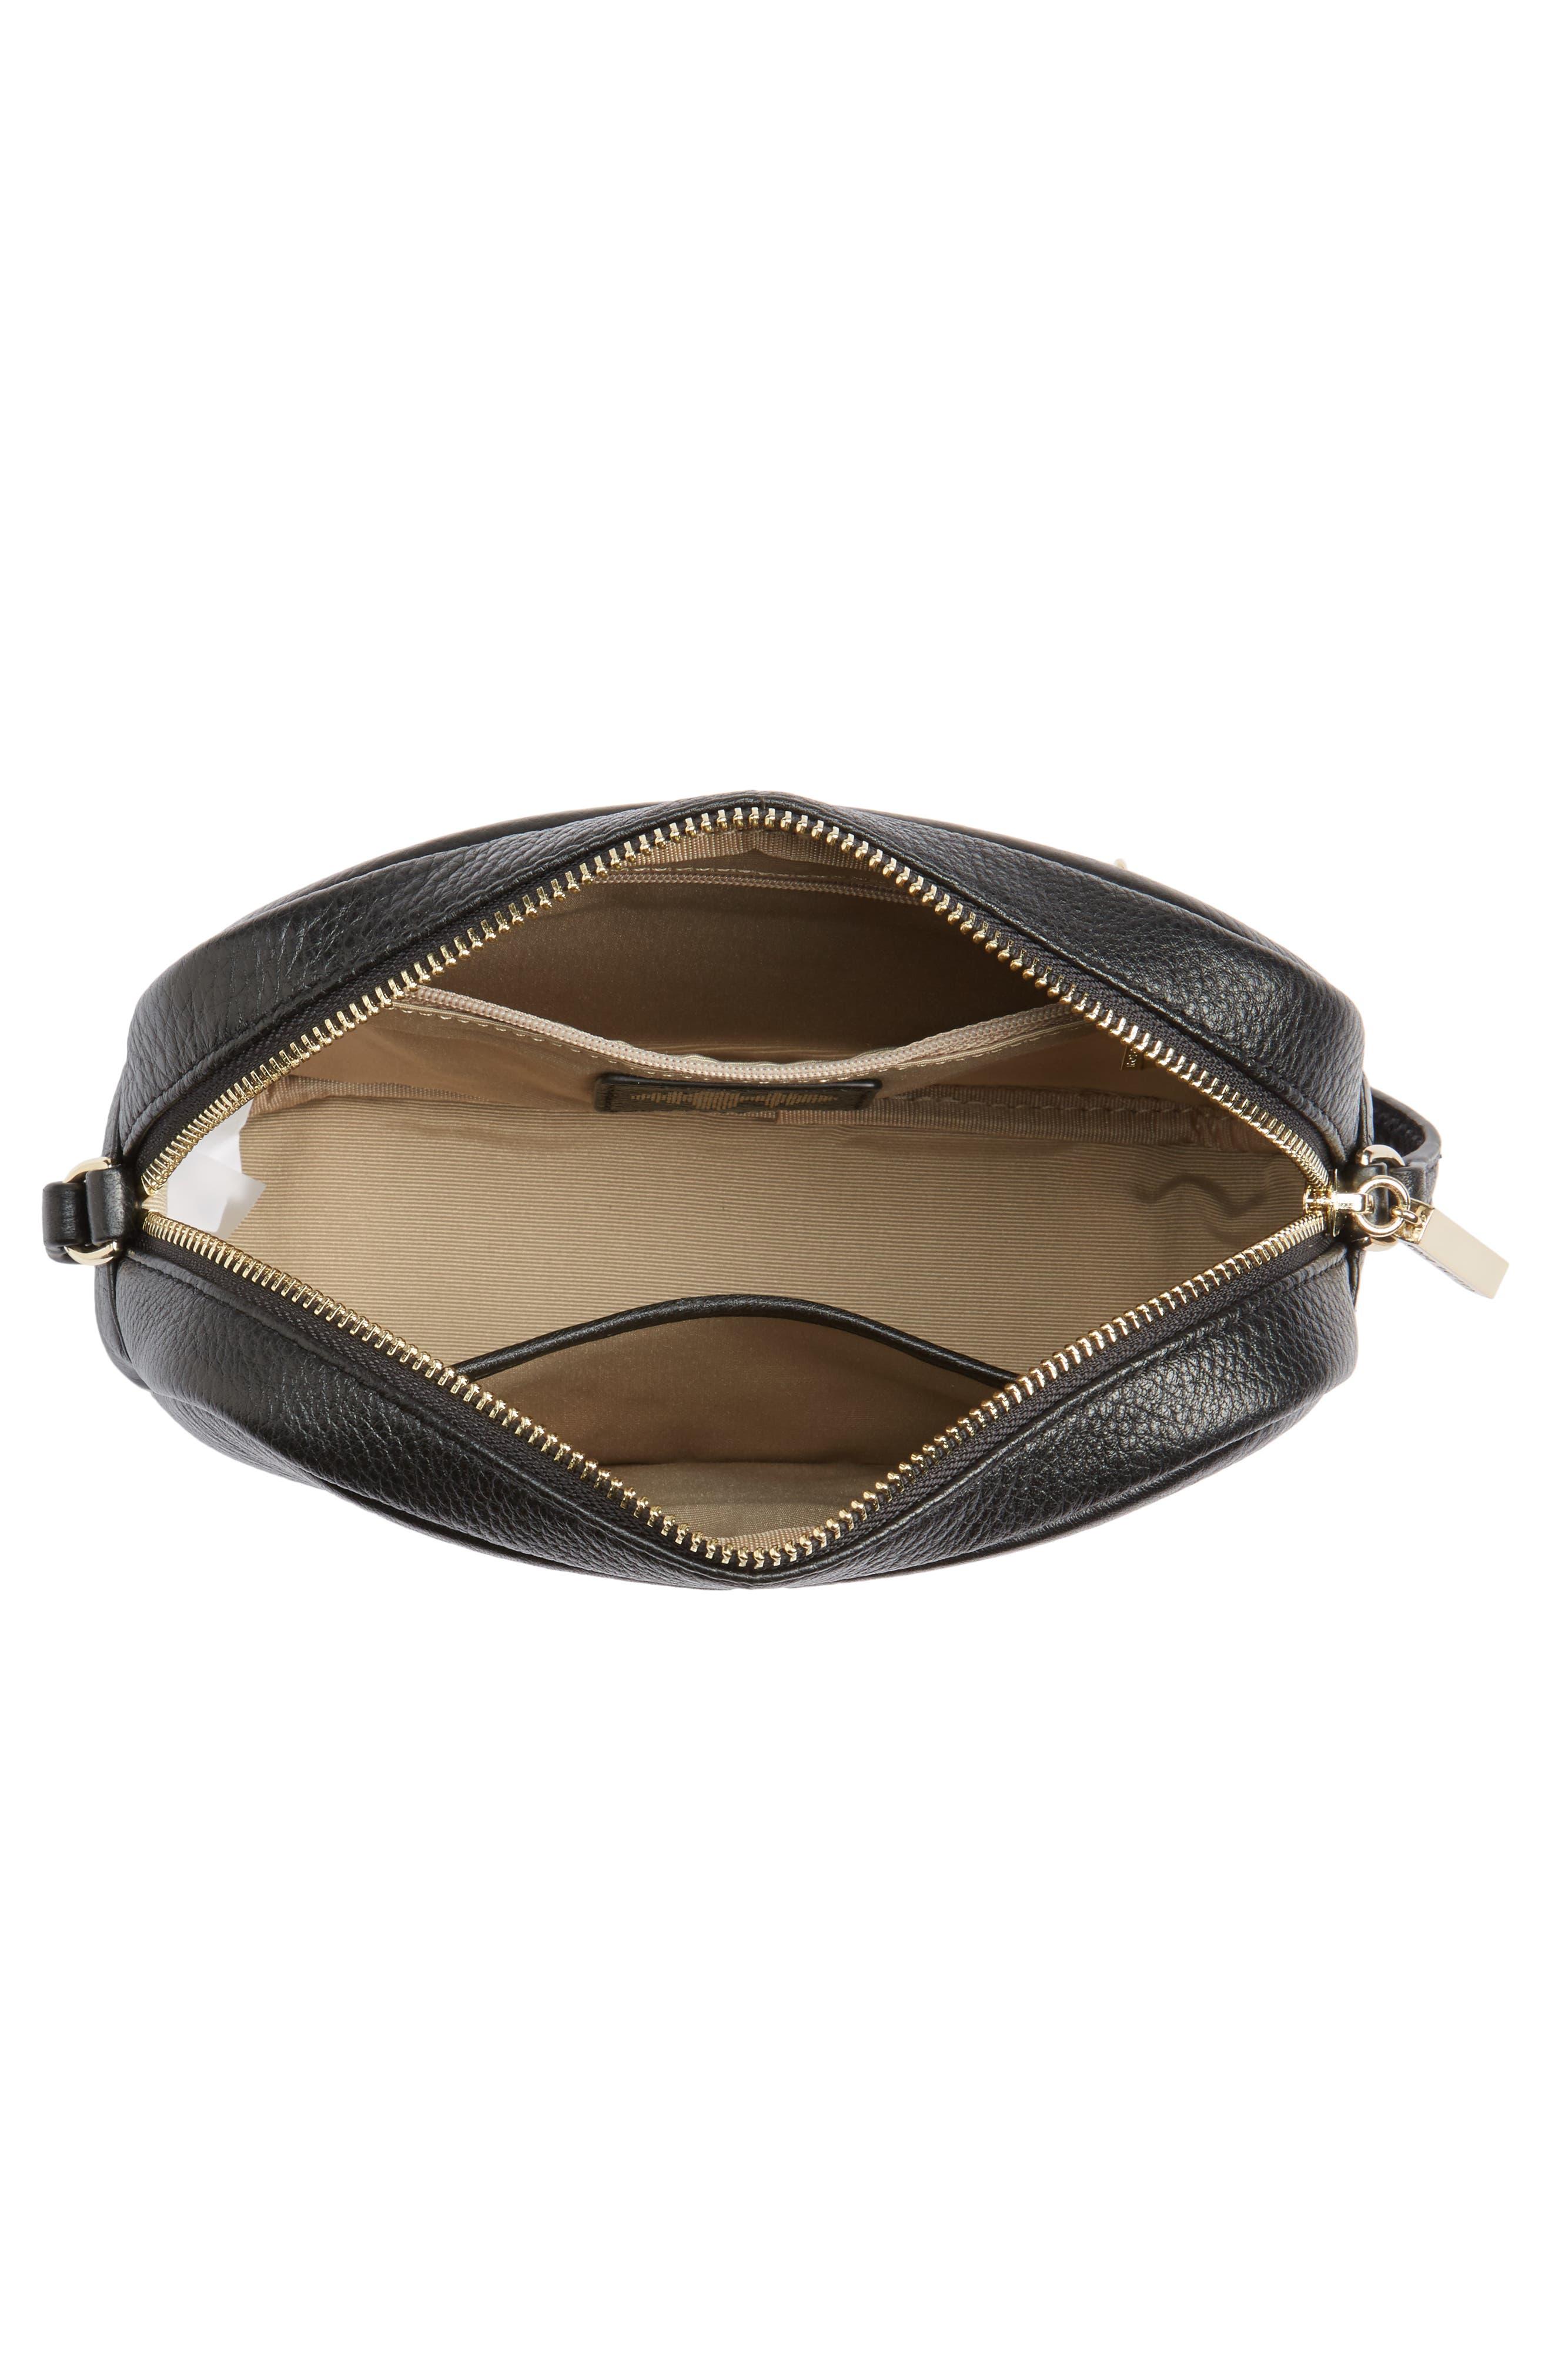 Céline Dion Adagio Leather Camera Crossbody Bag,                             Alternate thumbnail 4, color,                             001